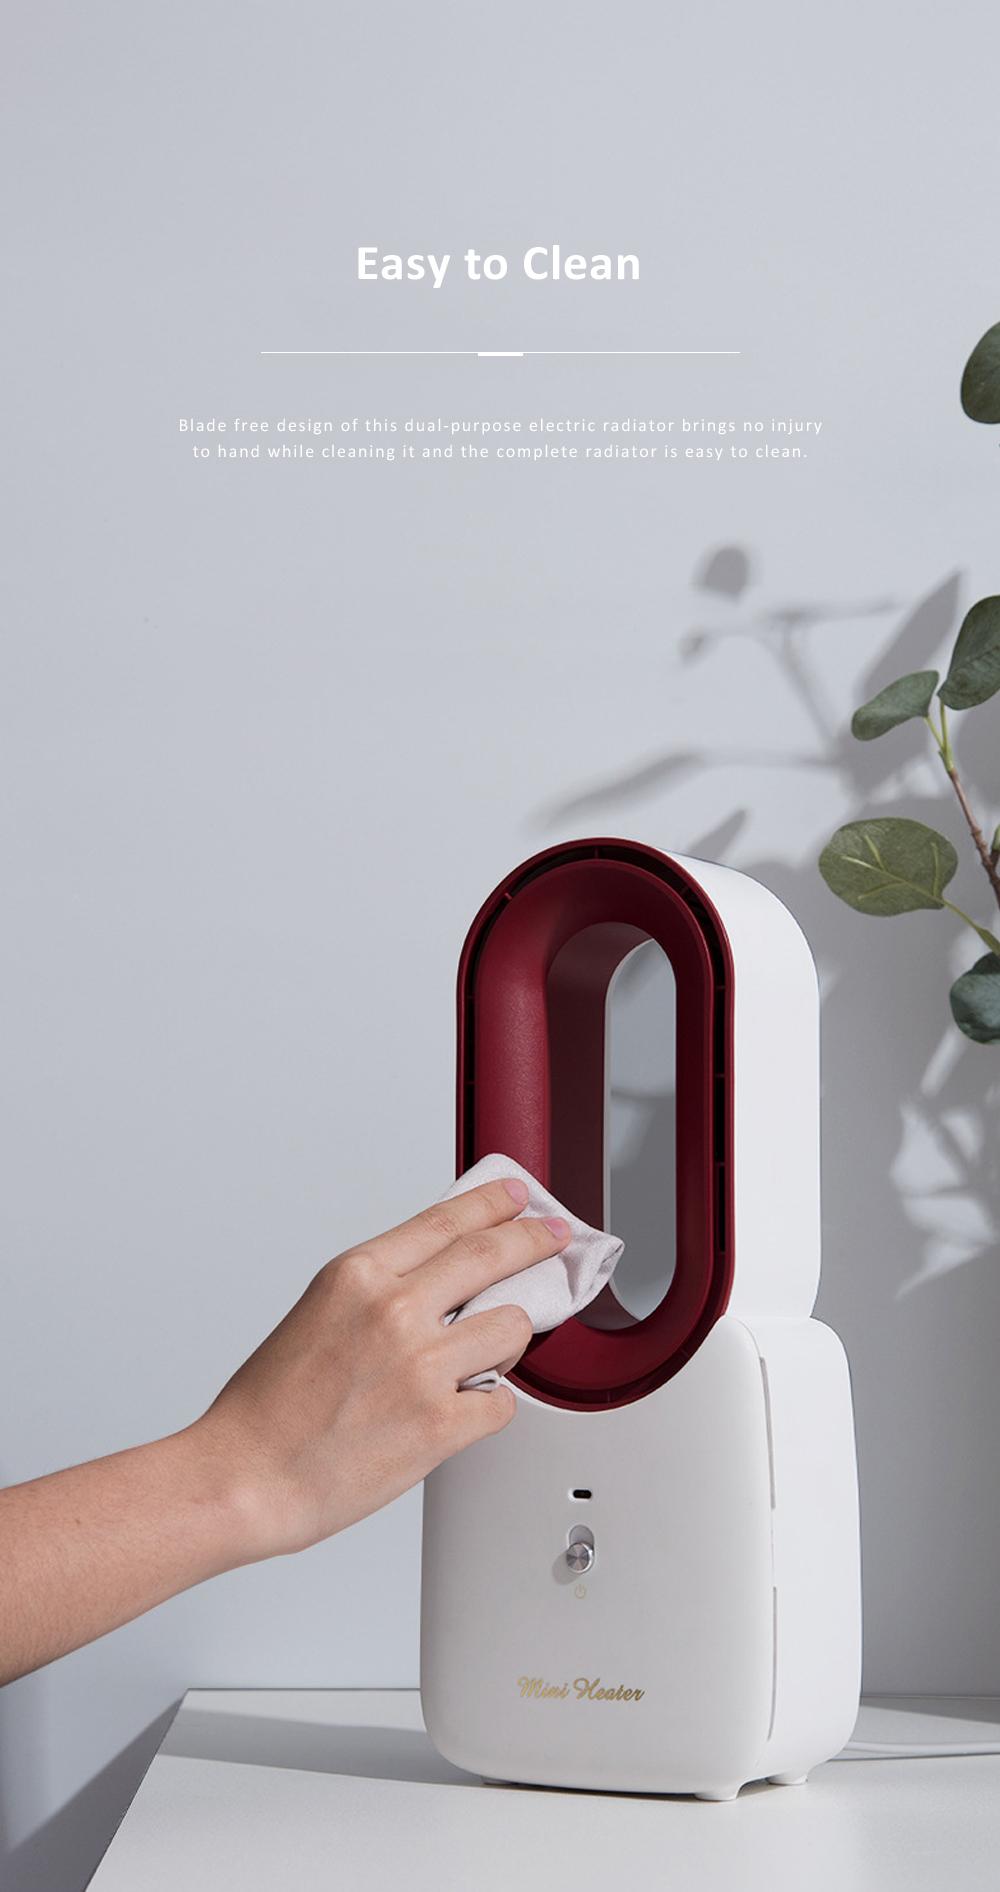 Home Office Desktop Heater for Energy-saving Mini Warmer Blade Free Dual-purpose Electric Radiator 10